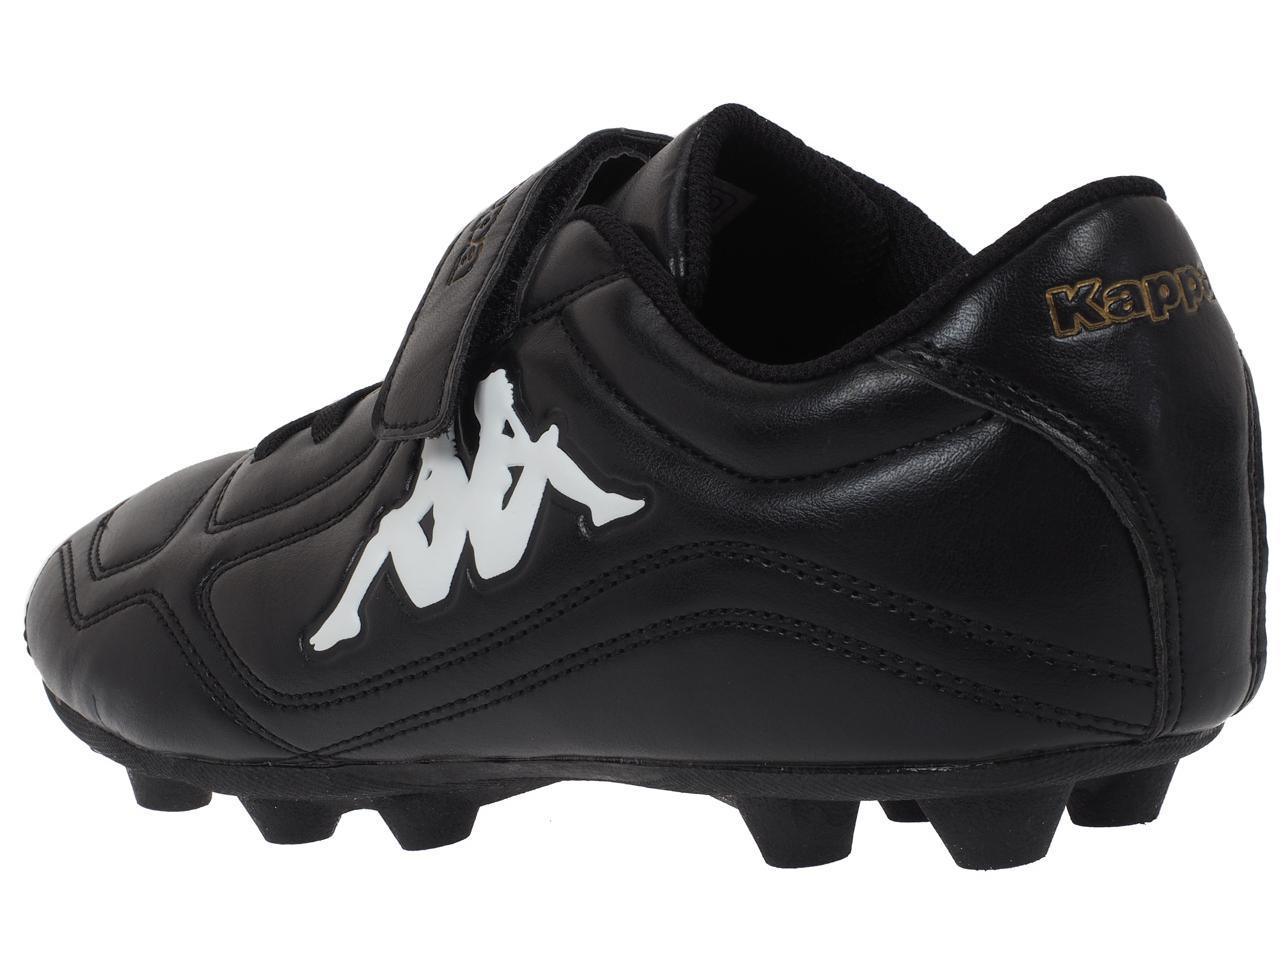 Football-Shoes-Molded-Kappa-Parek-Fg-Kid-Black-Black-75087-New thumbnail 3